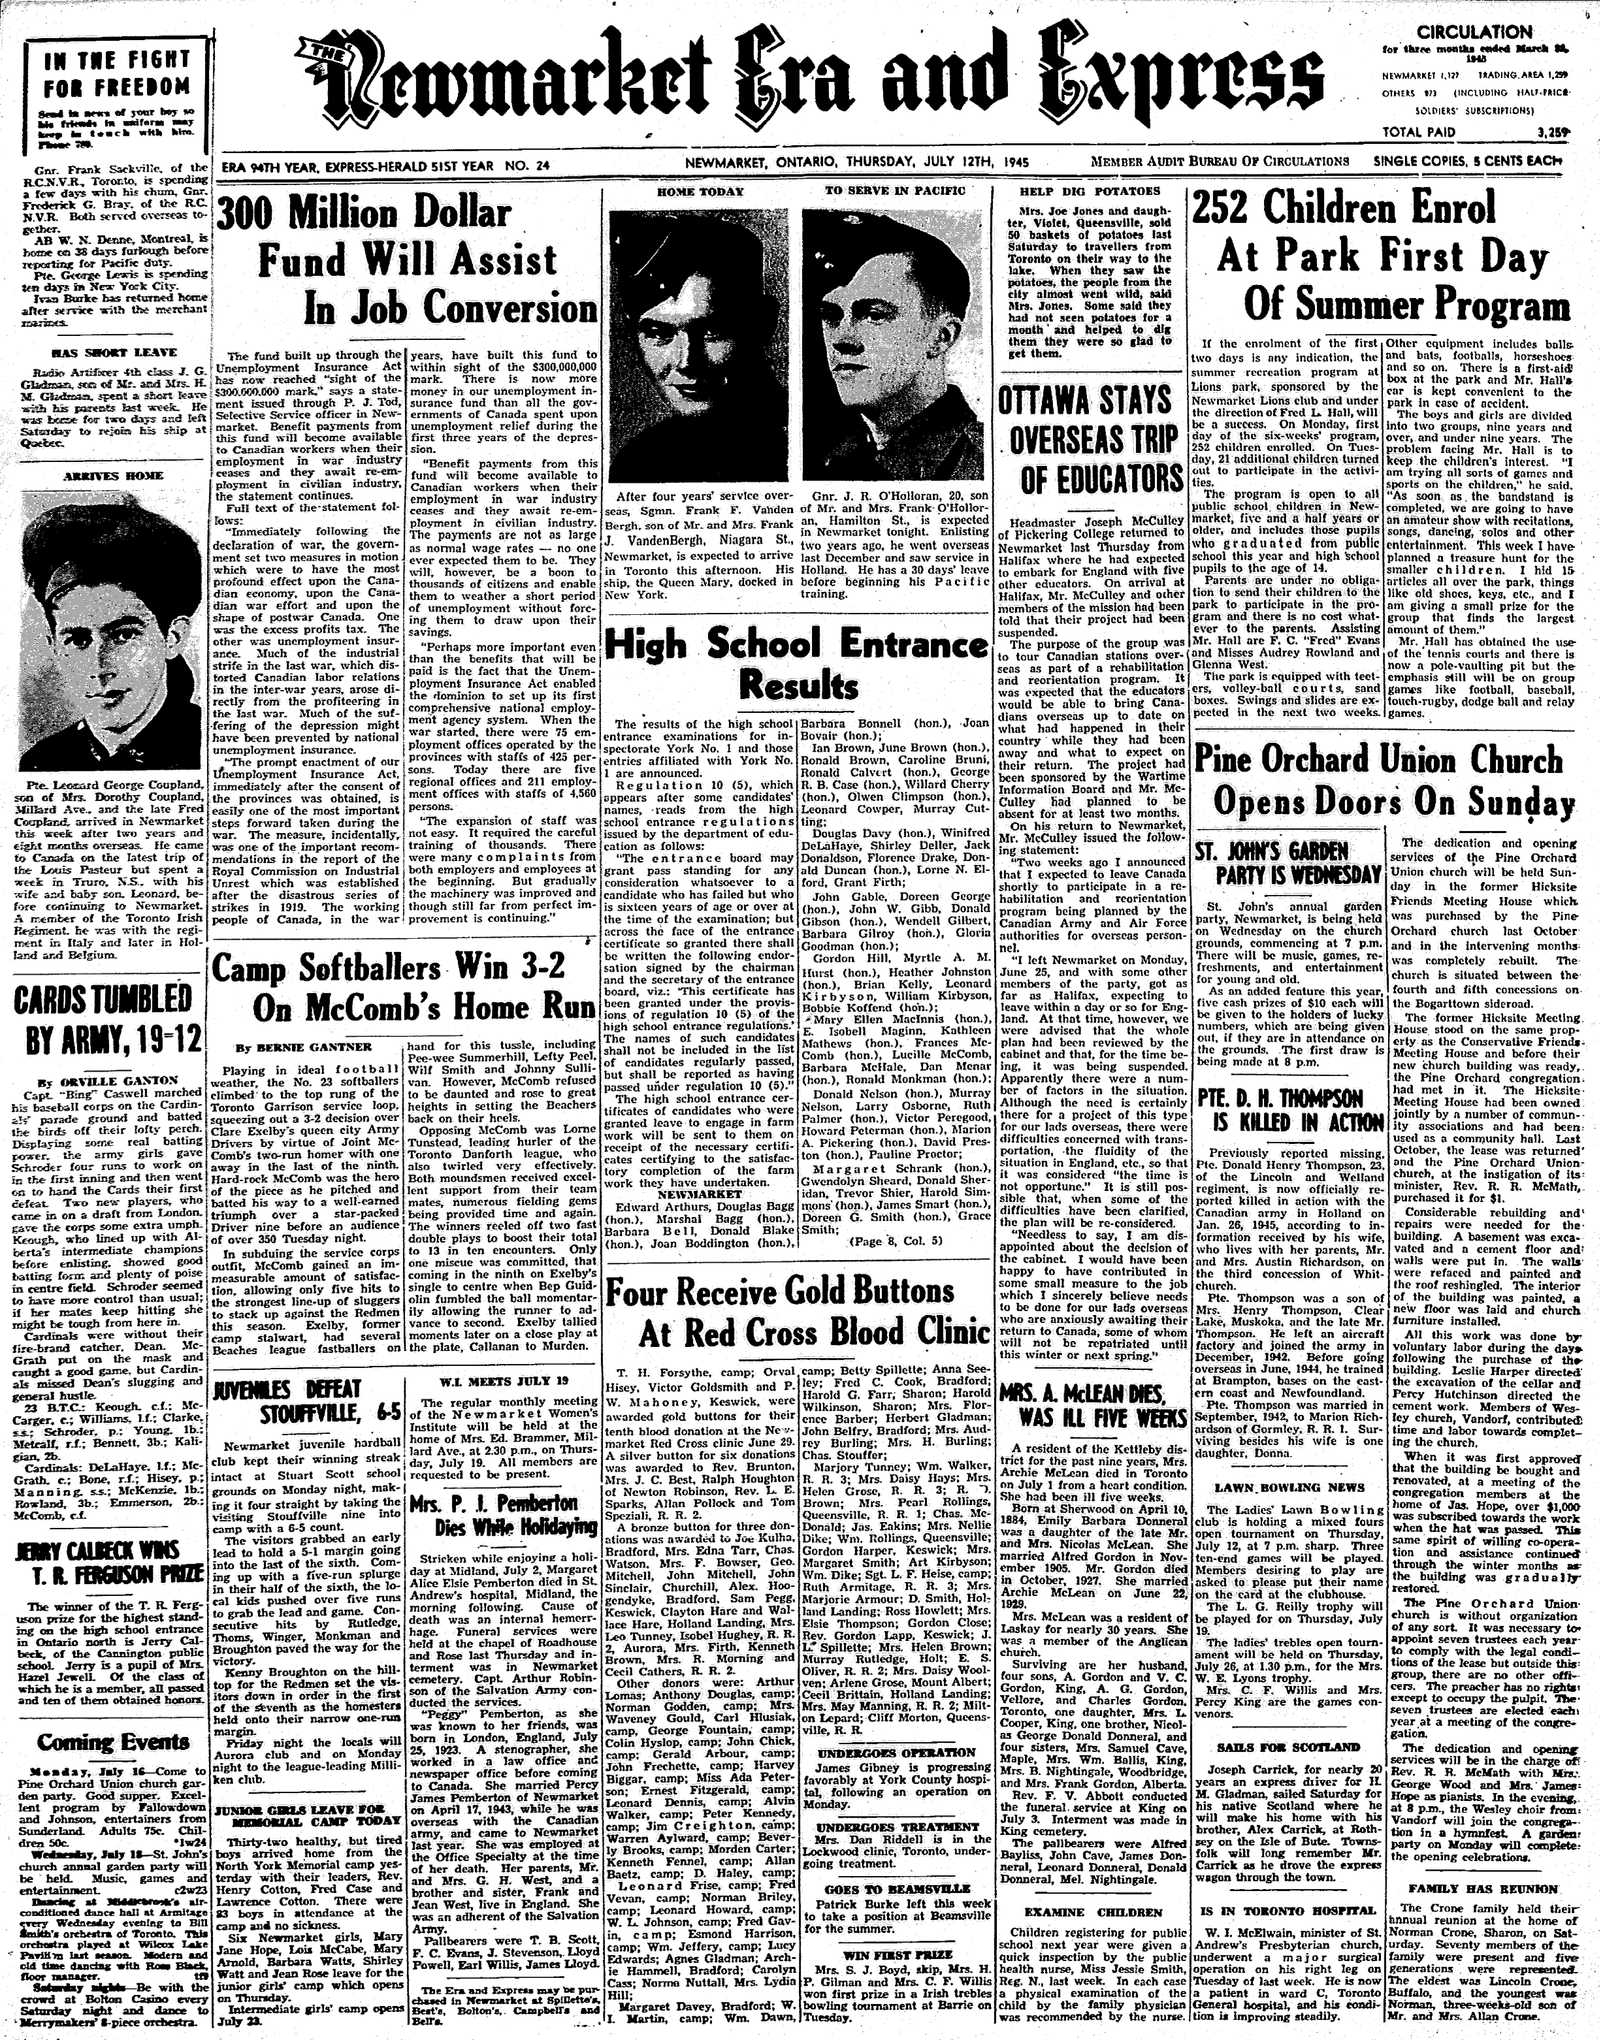 Newmarket Era and Express (Newmarket, ON), July 12, 1945